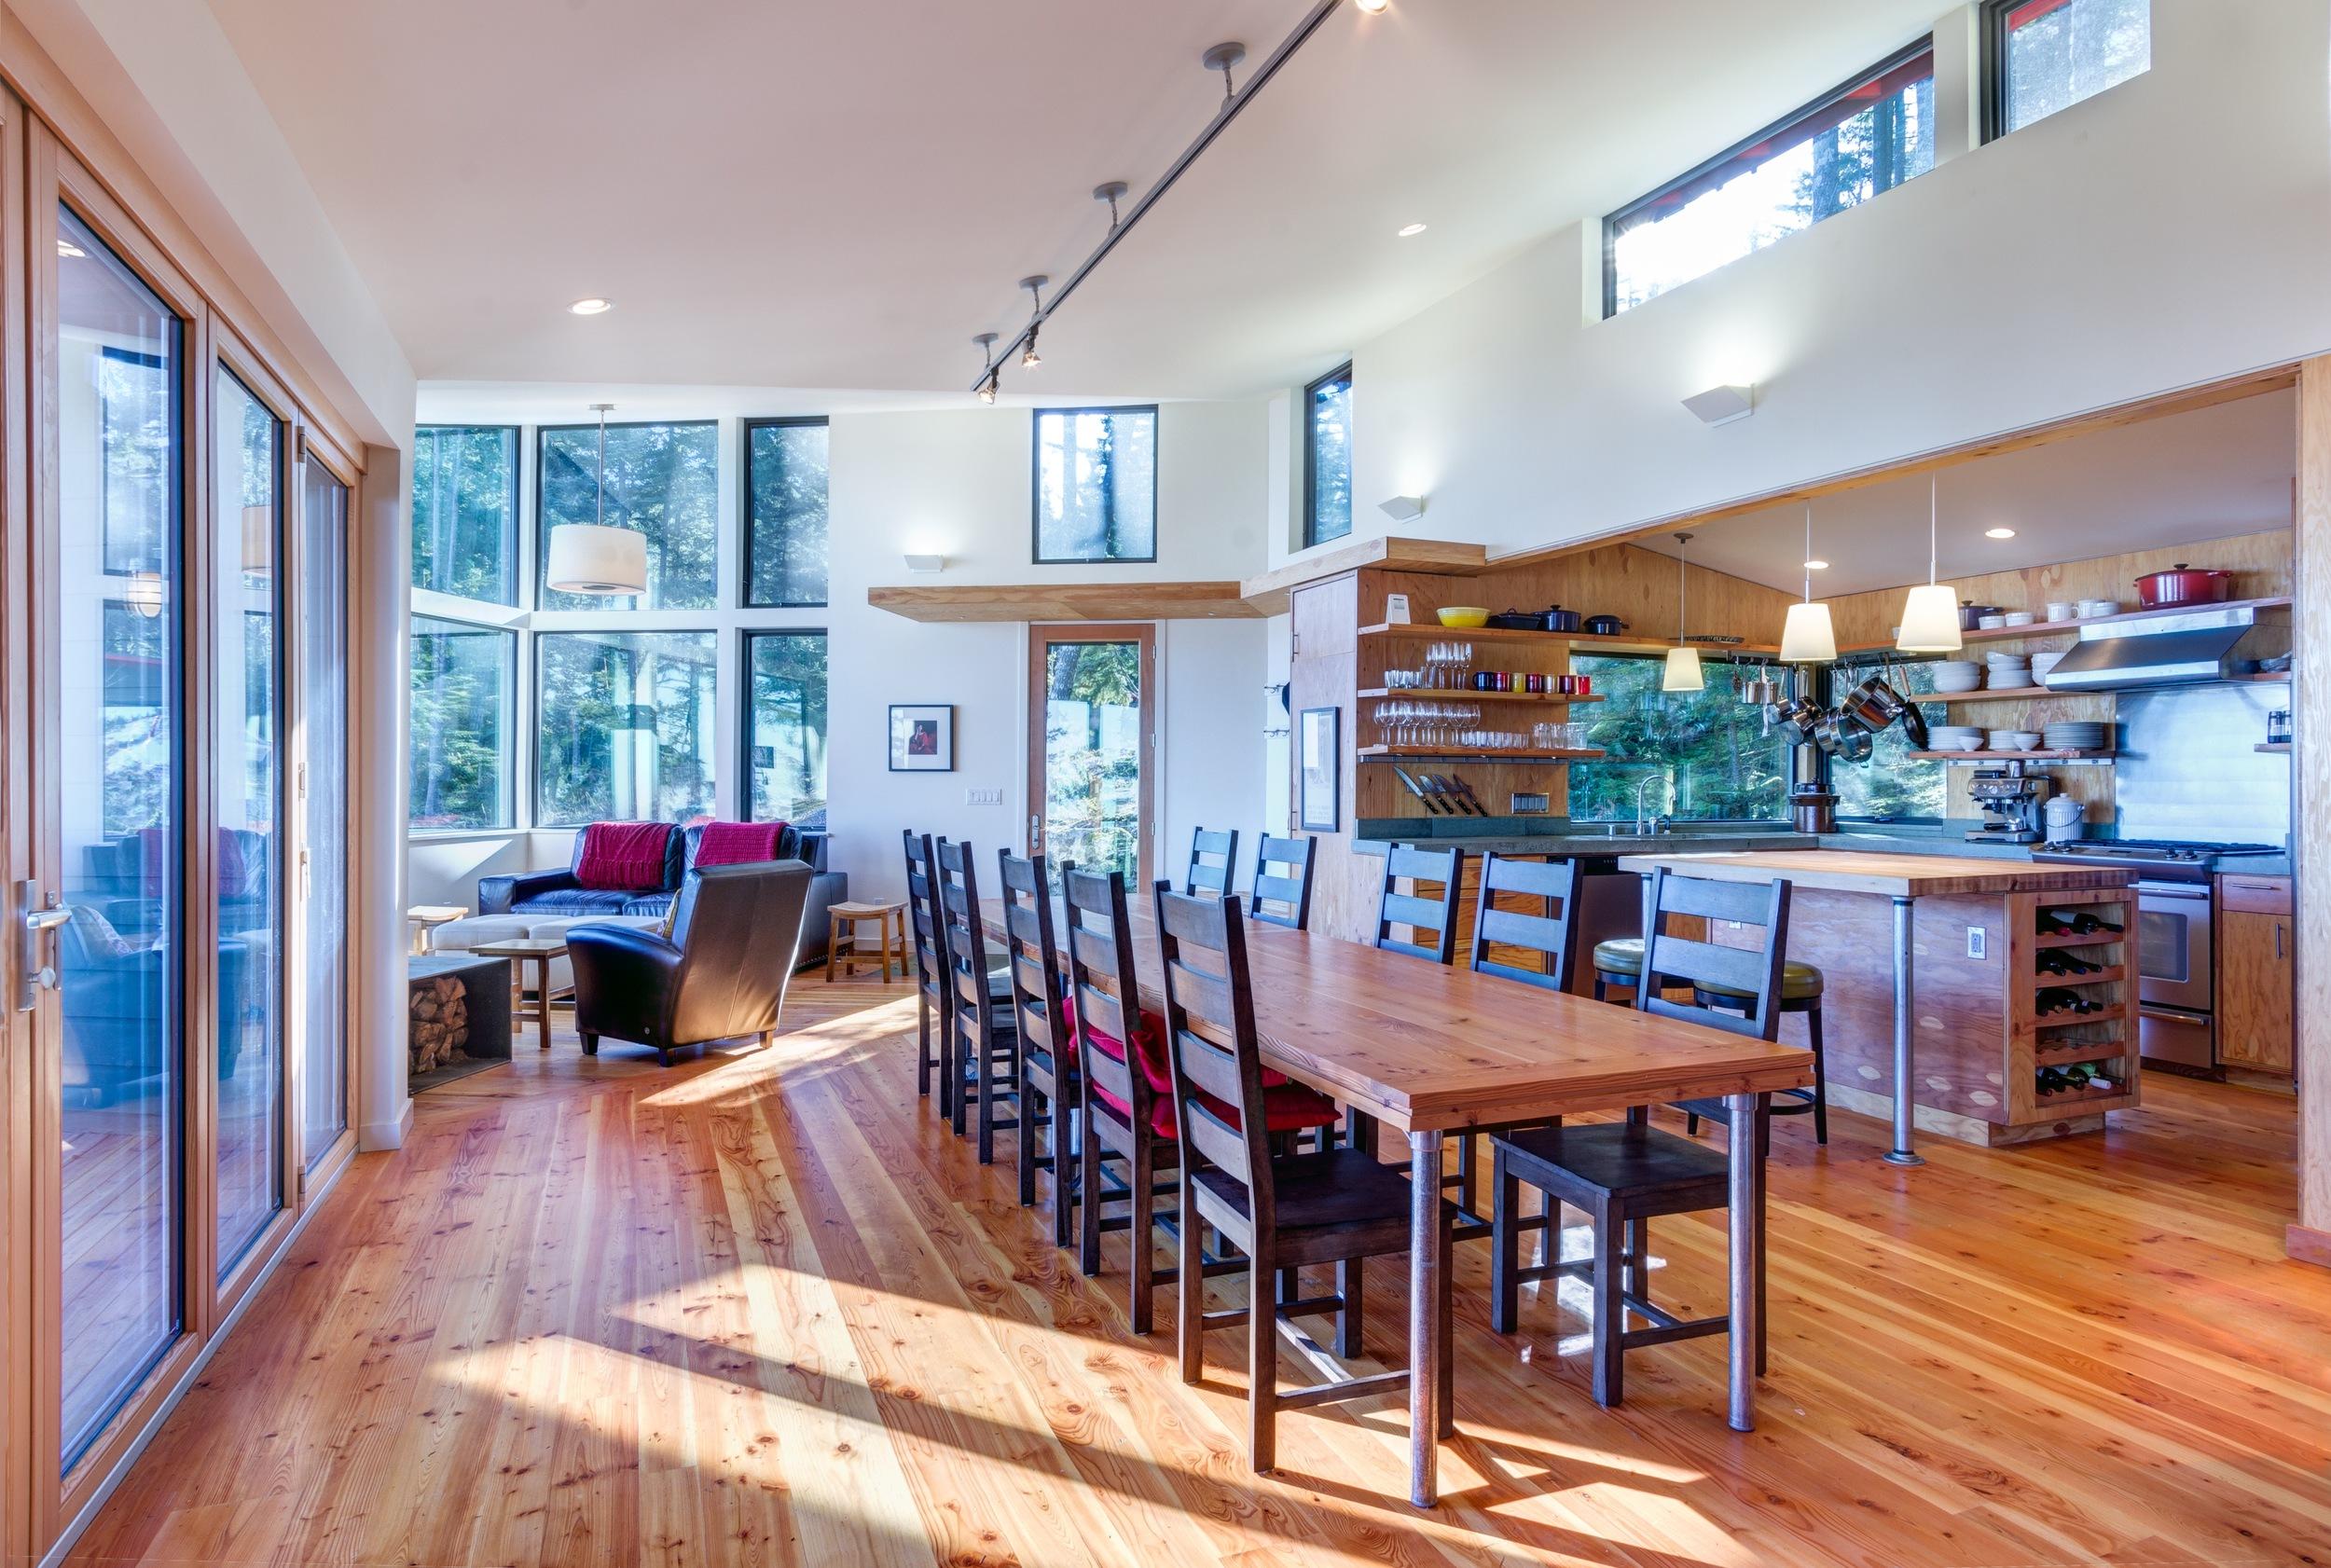 O'Hara/Weber by Stoltz Kau Architects